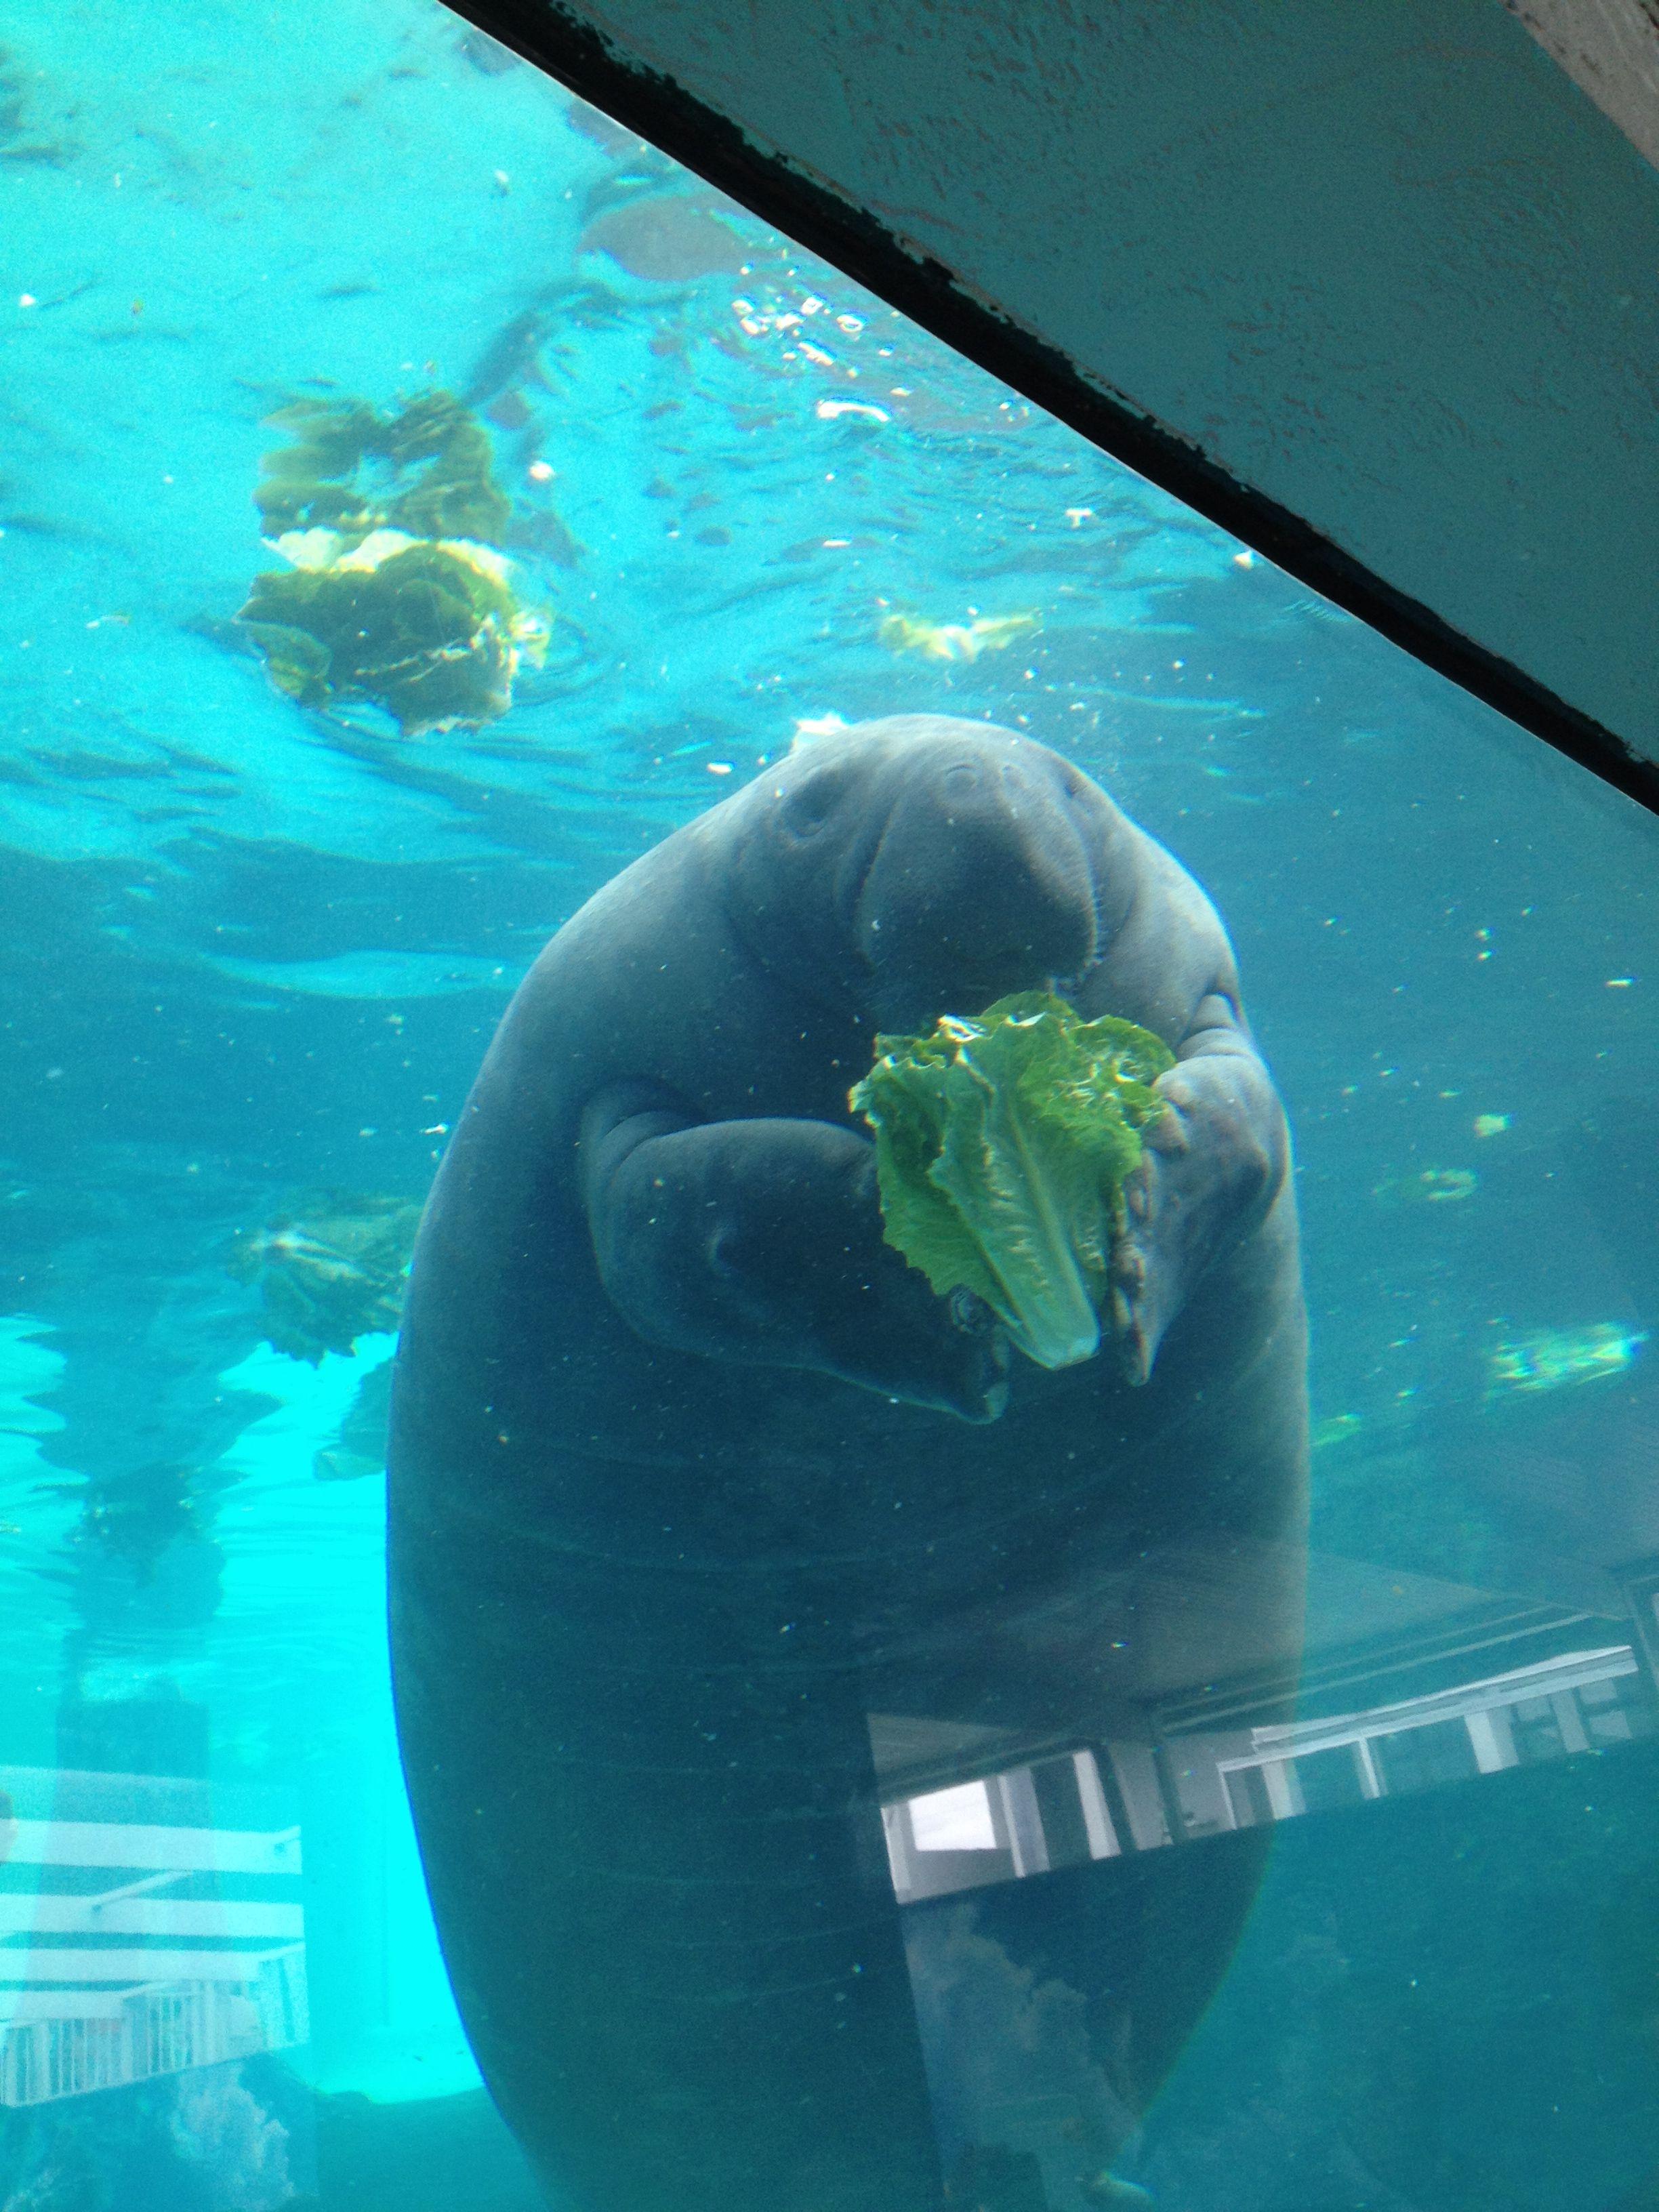 mote aquarium manatee eating a whole dang thing of lettuce